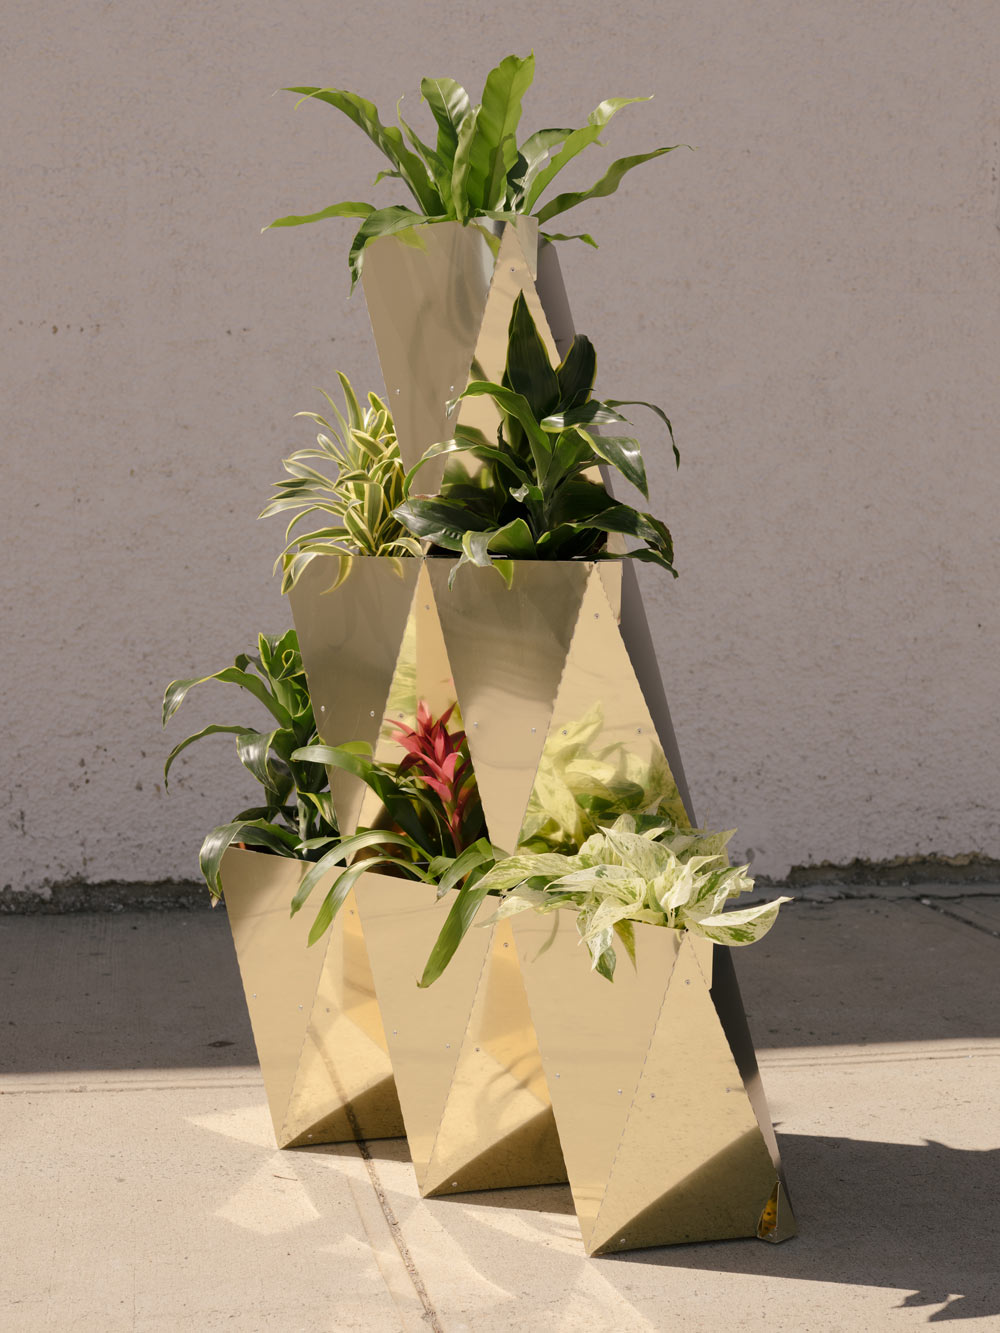 Prism Planter Modular Planter System. Photo: Dan McMahon